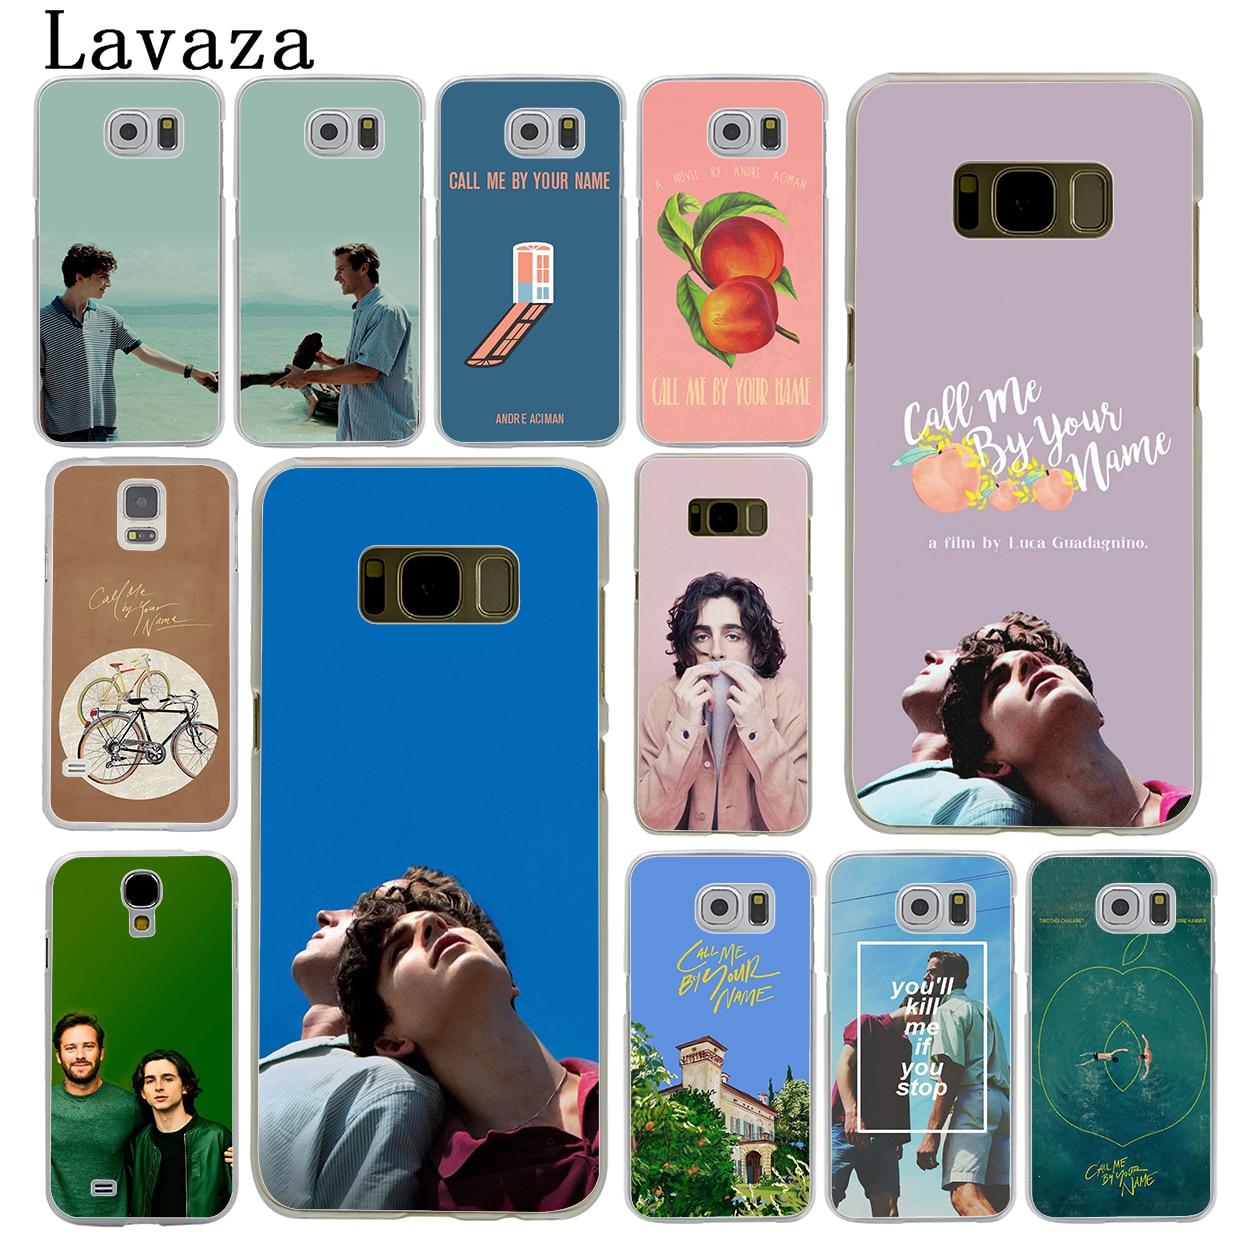 Lavaza Call Me на Ваше имя жесткий кожи телефон чехла для samsung Galaxy S7 S6 край S3 S4 S5 и мини S8 S9 плюс крышка